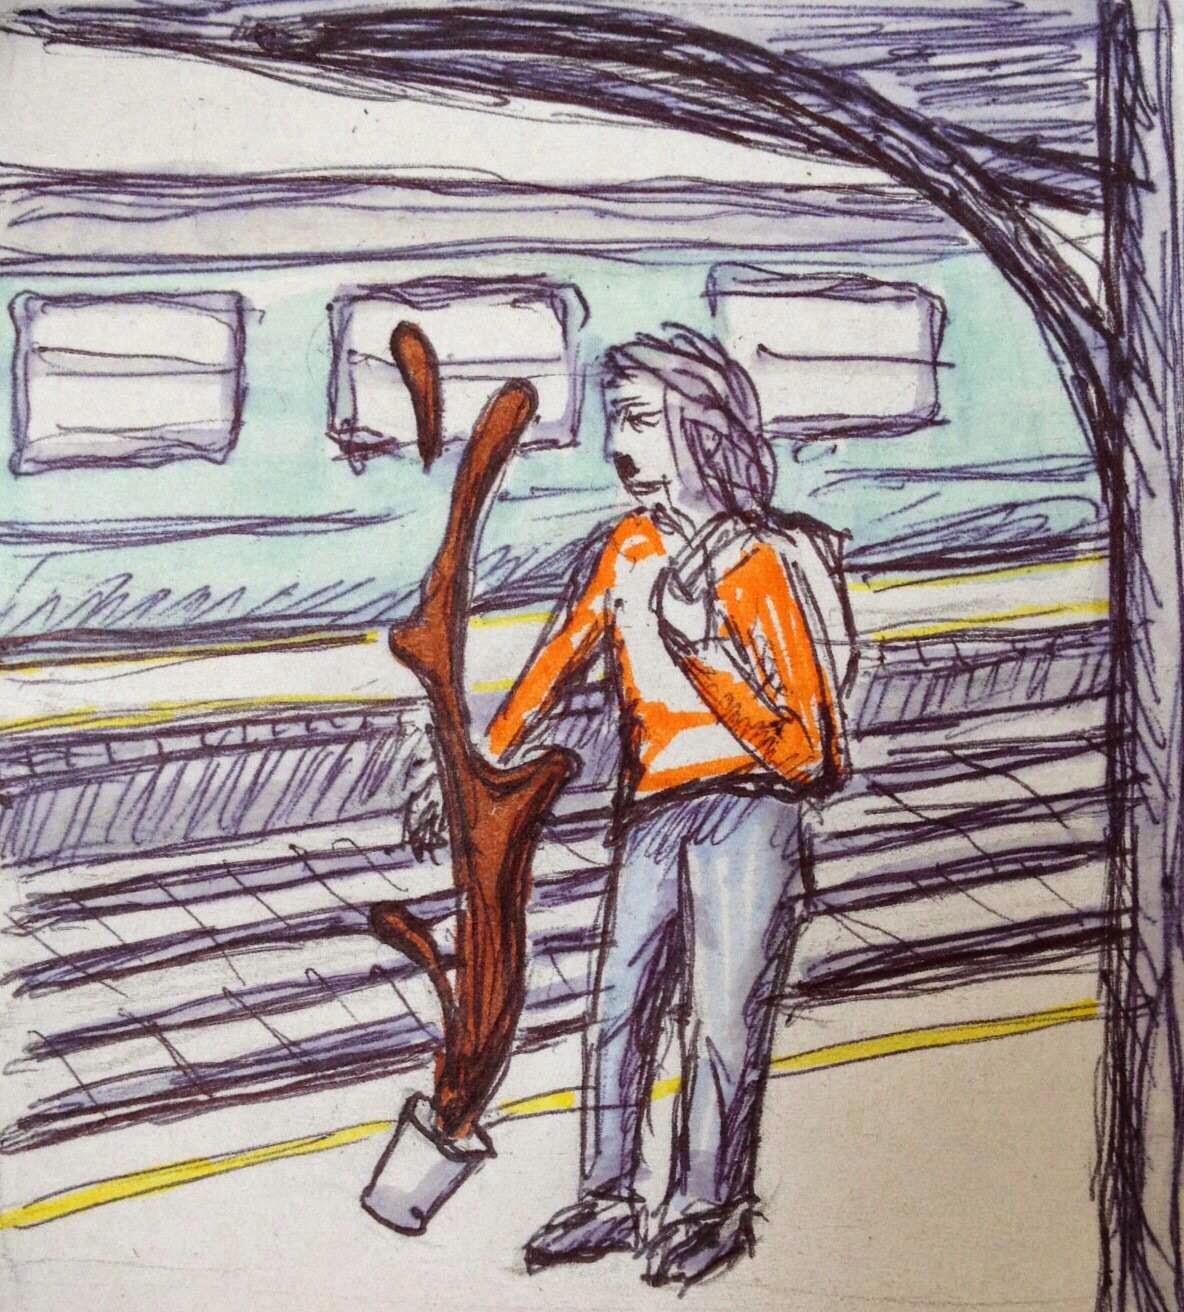 Wiersz Rysunek Sierpnia 2014